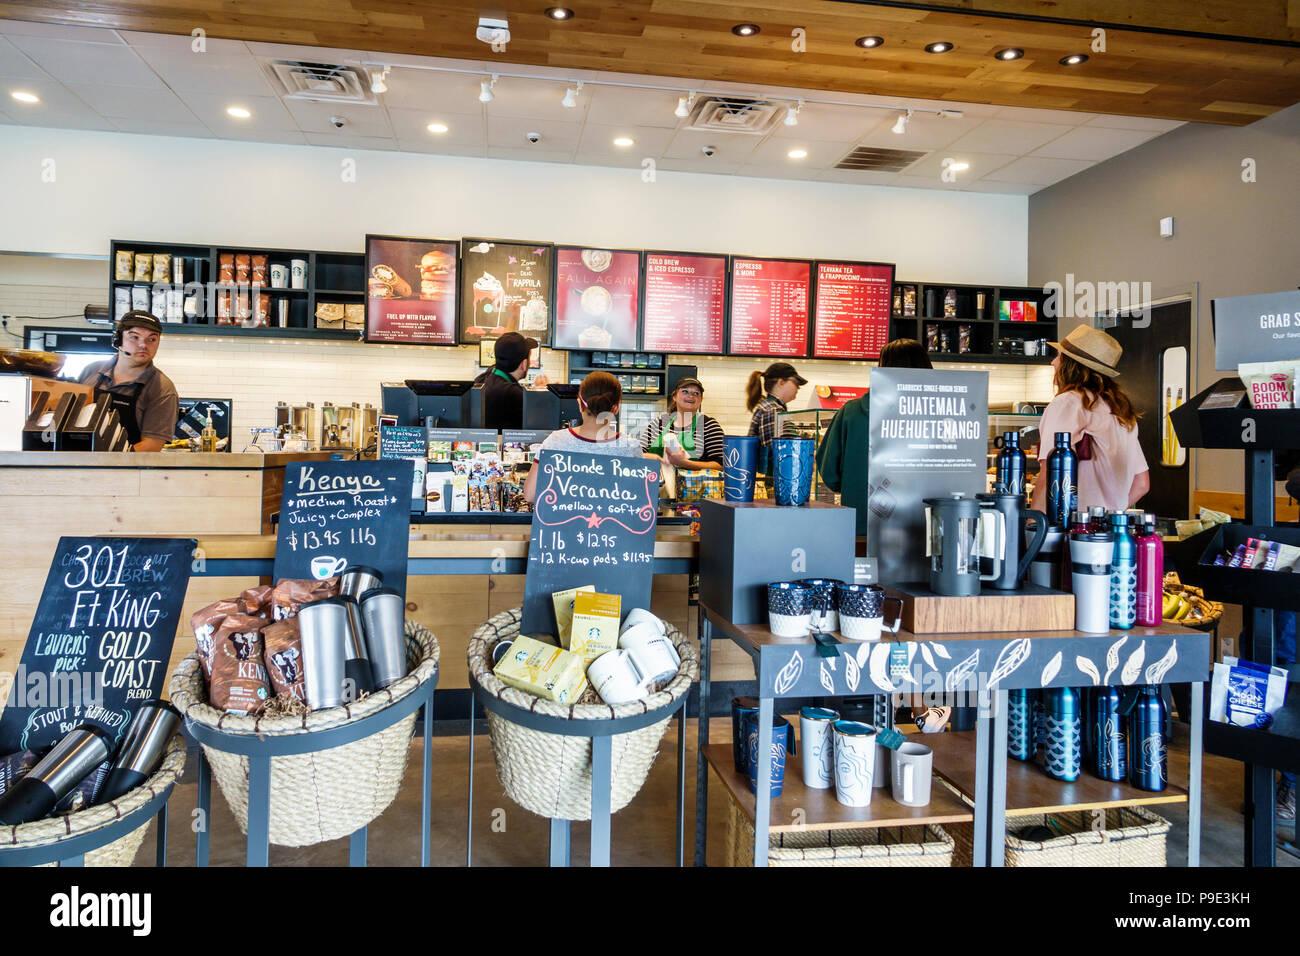 Starbucks Coffee Man Stockfotos & Starbucks Coffee Man Bilder - Alamy